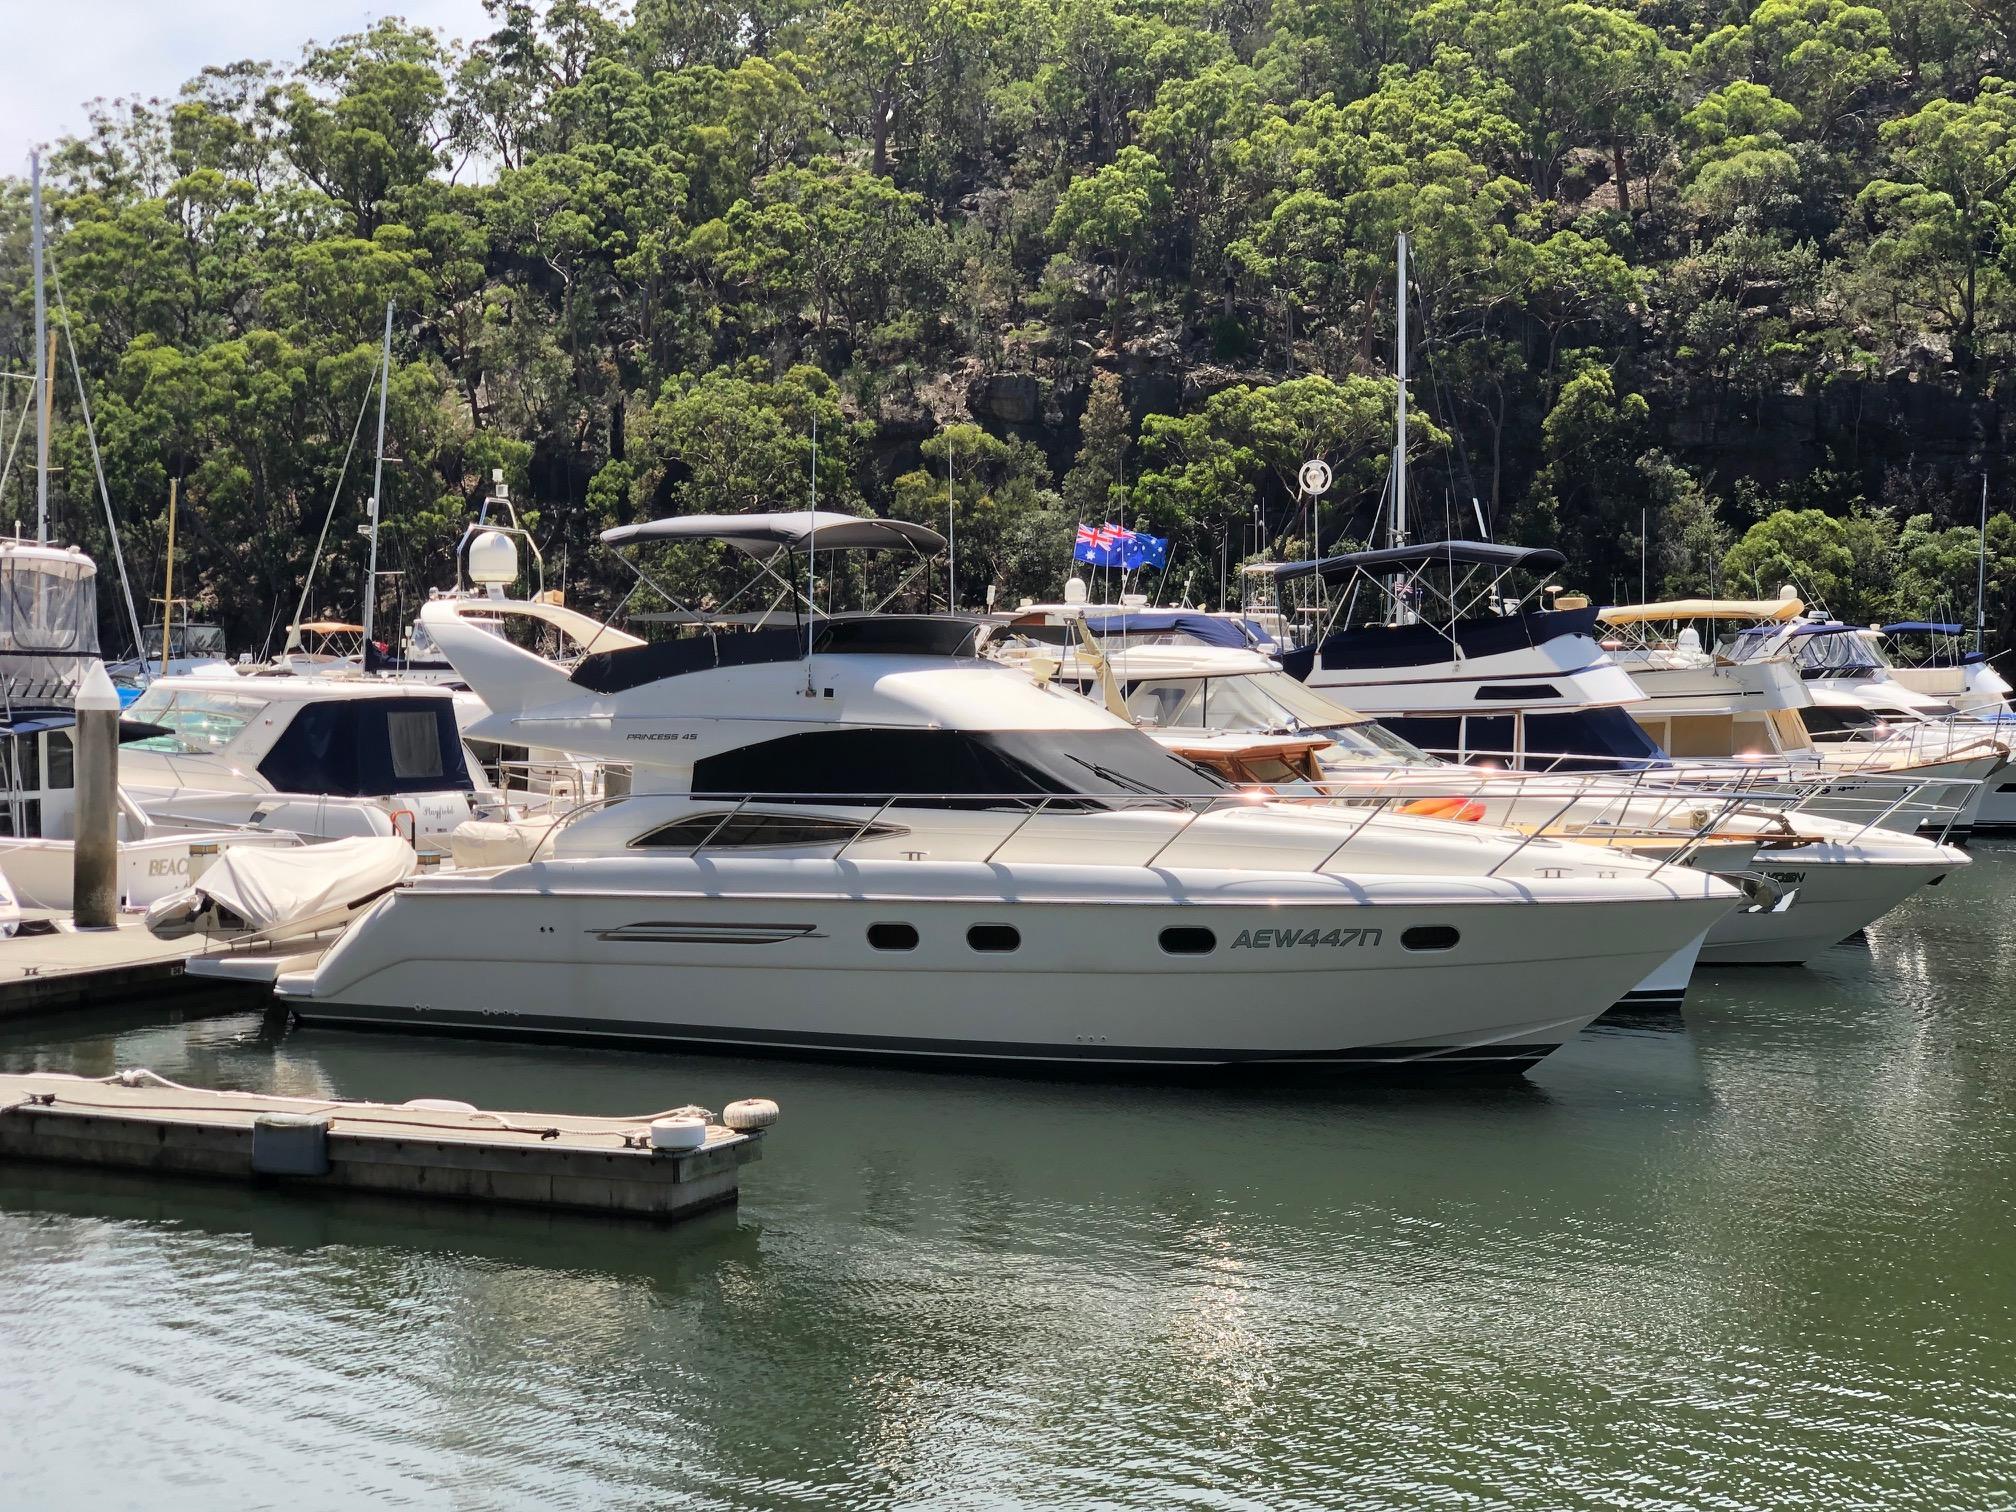 Princess 45 - 5th Share at Empire Marina Bobbin Head